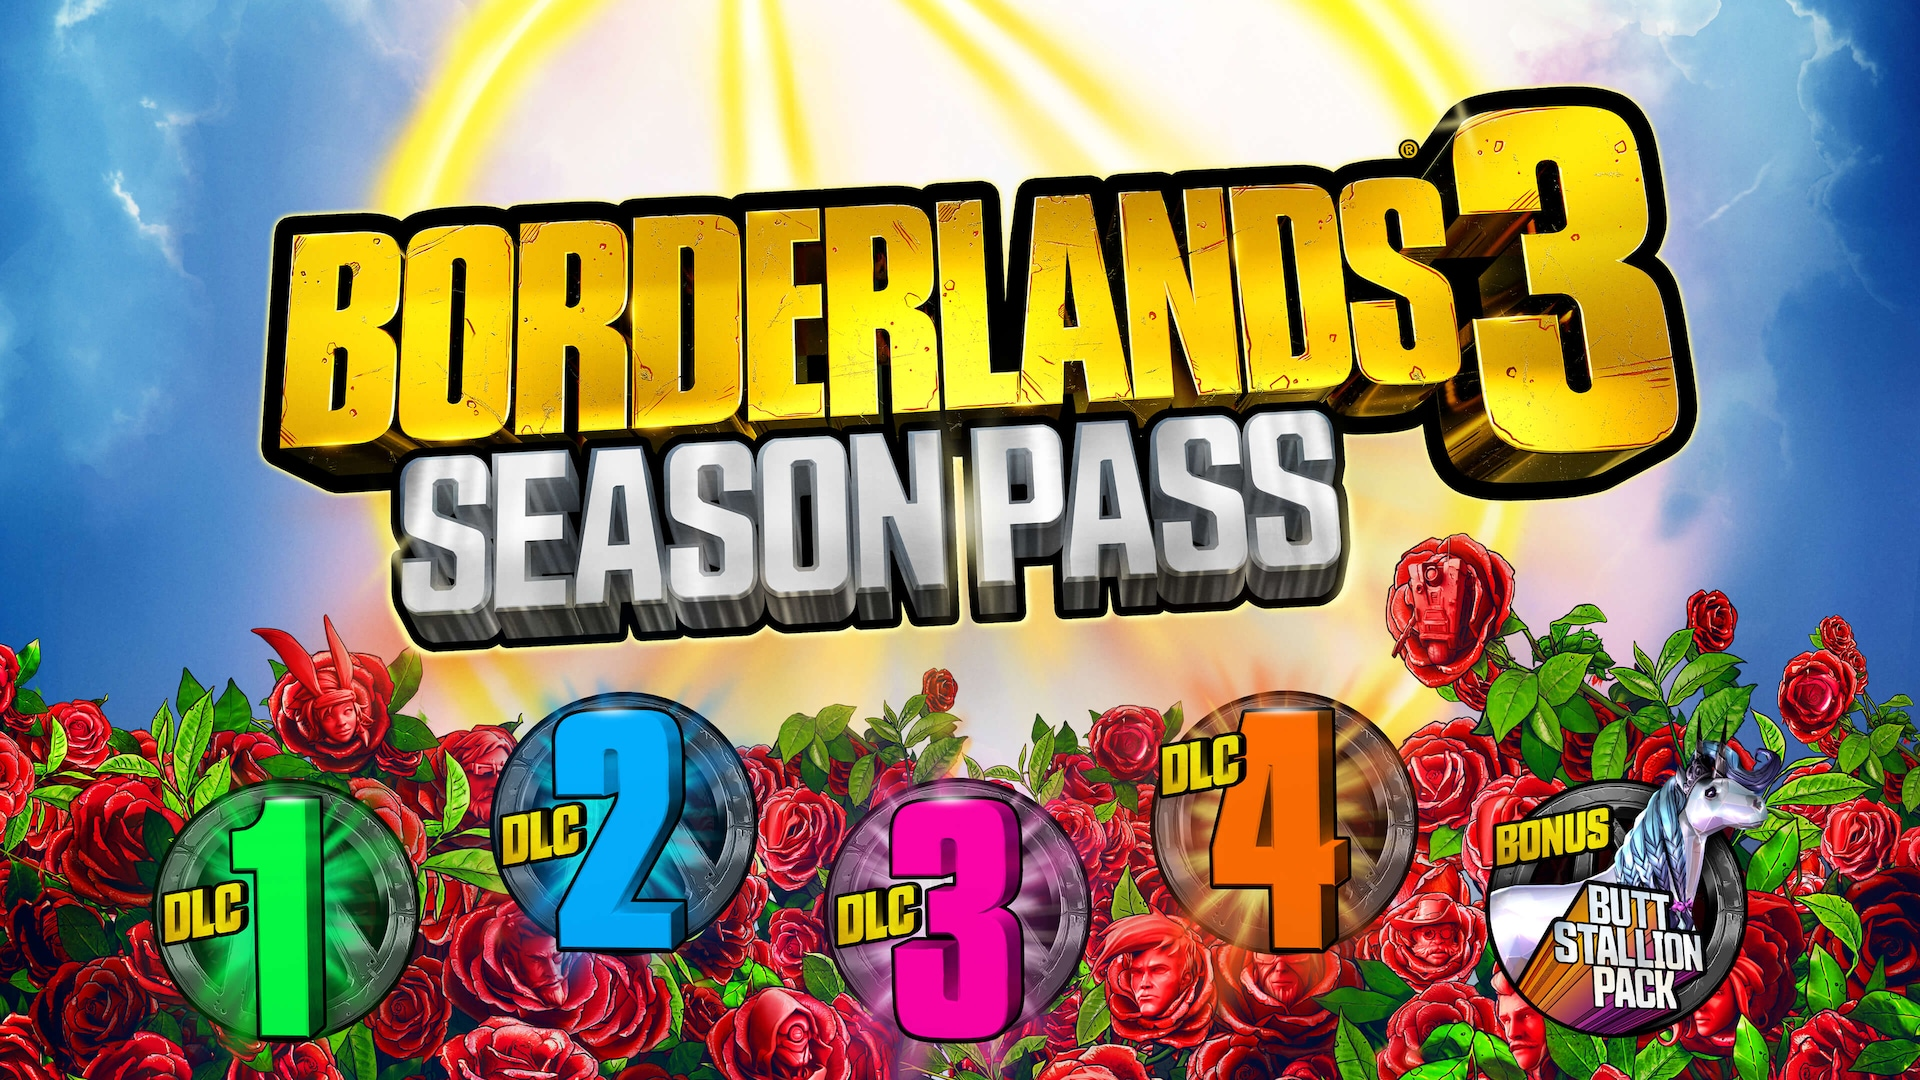 Borderlands 3 Borderlands 3 Season Pass